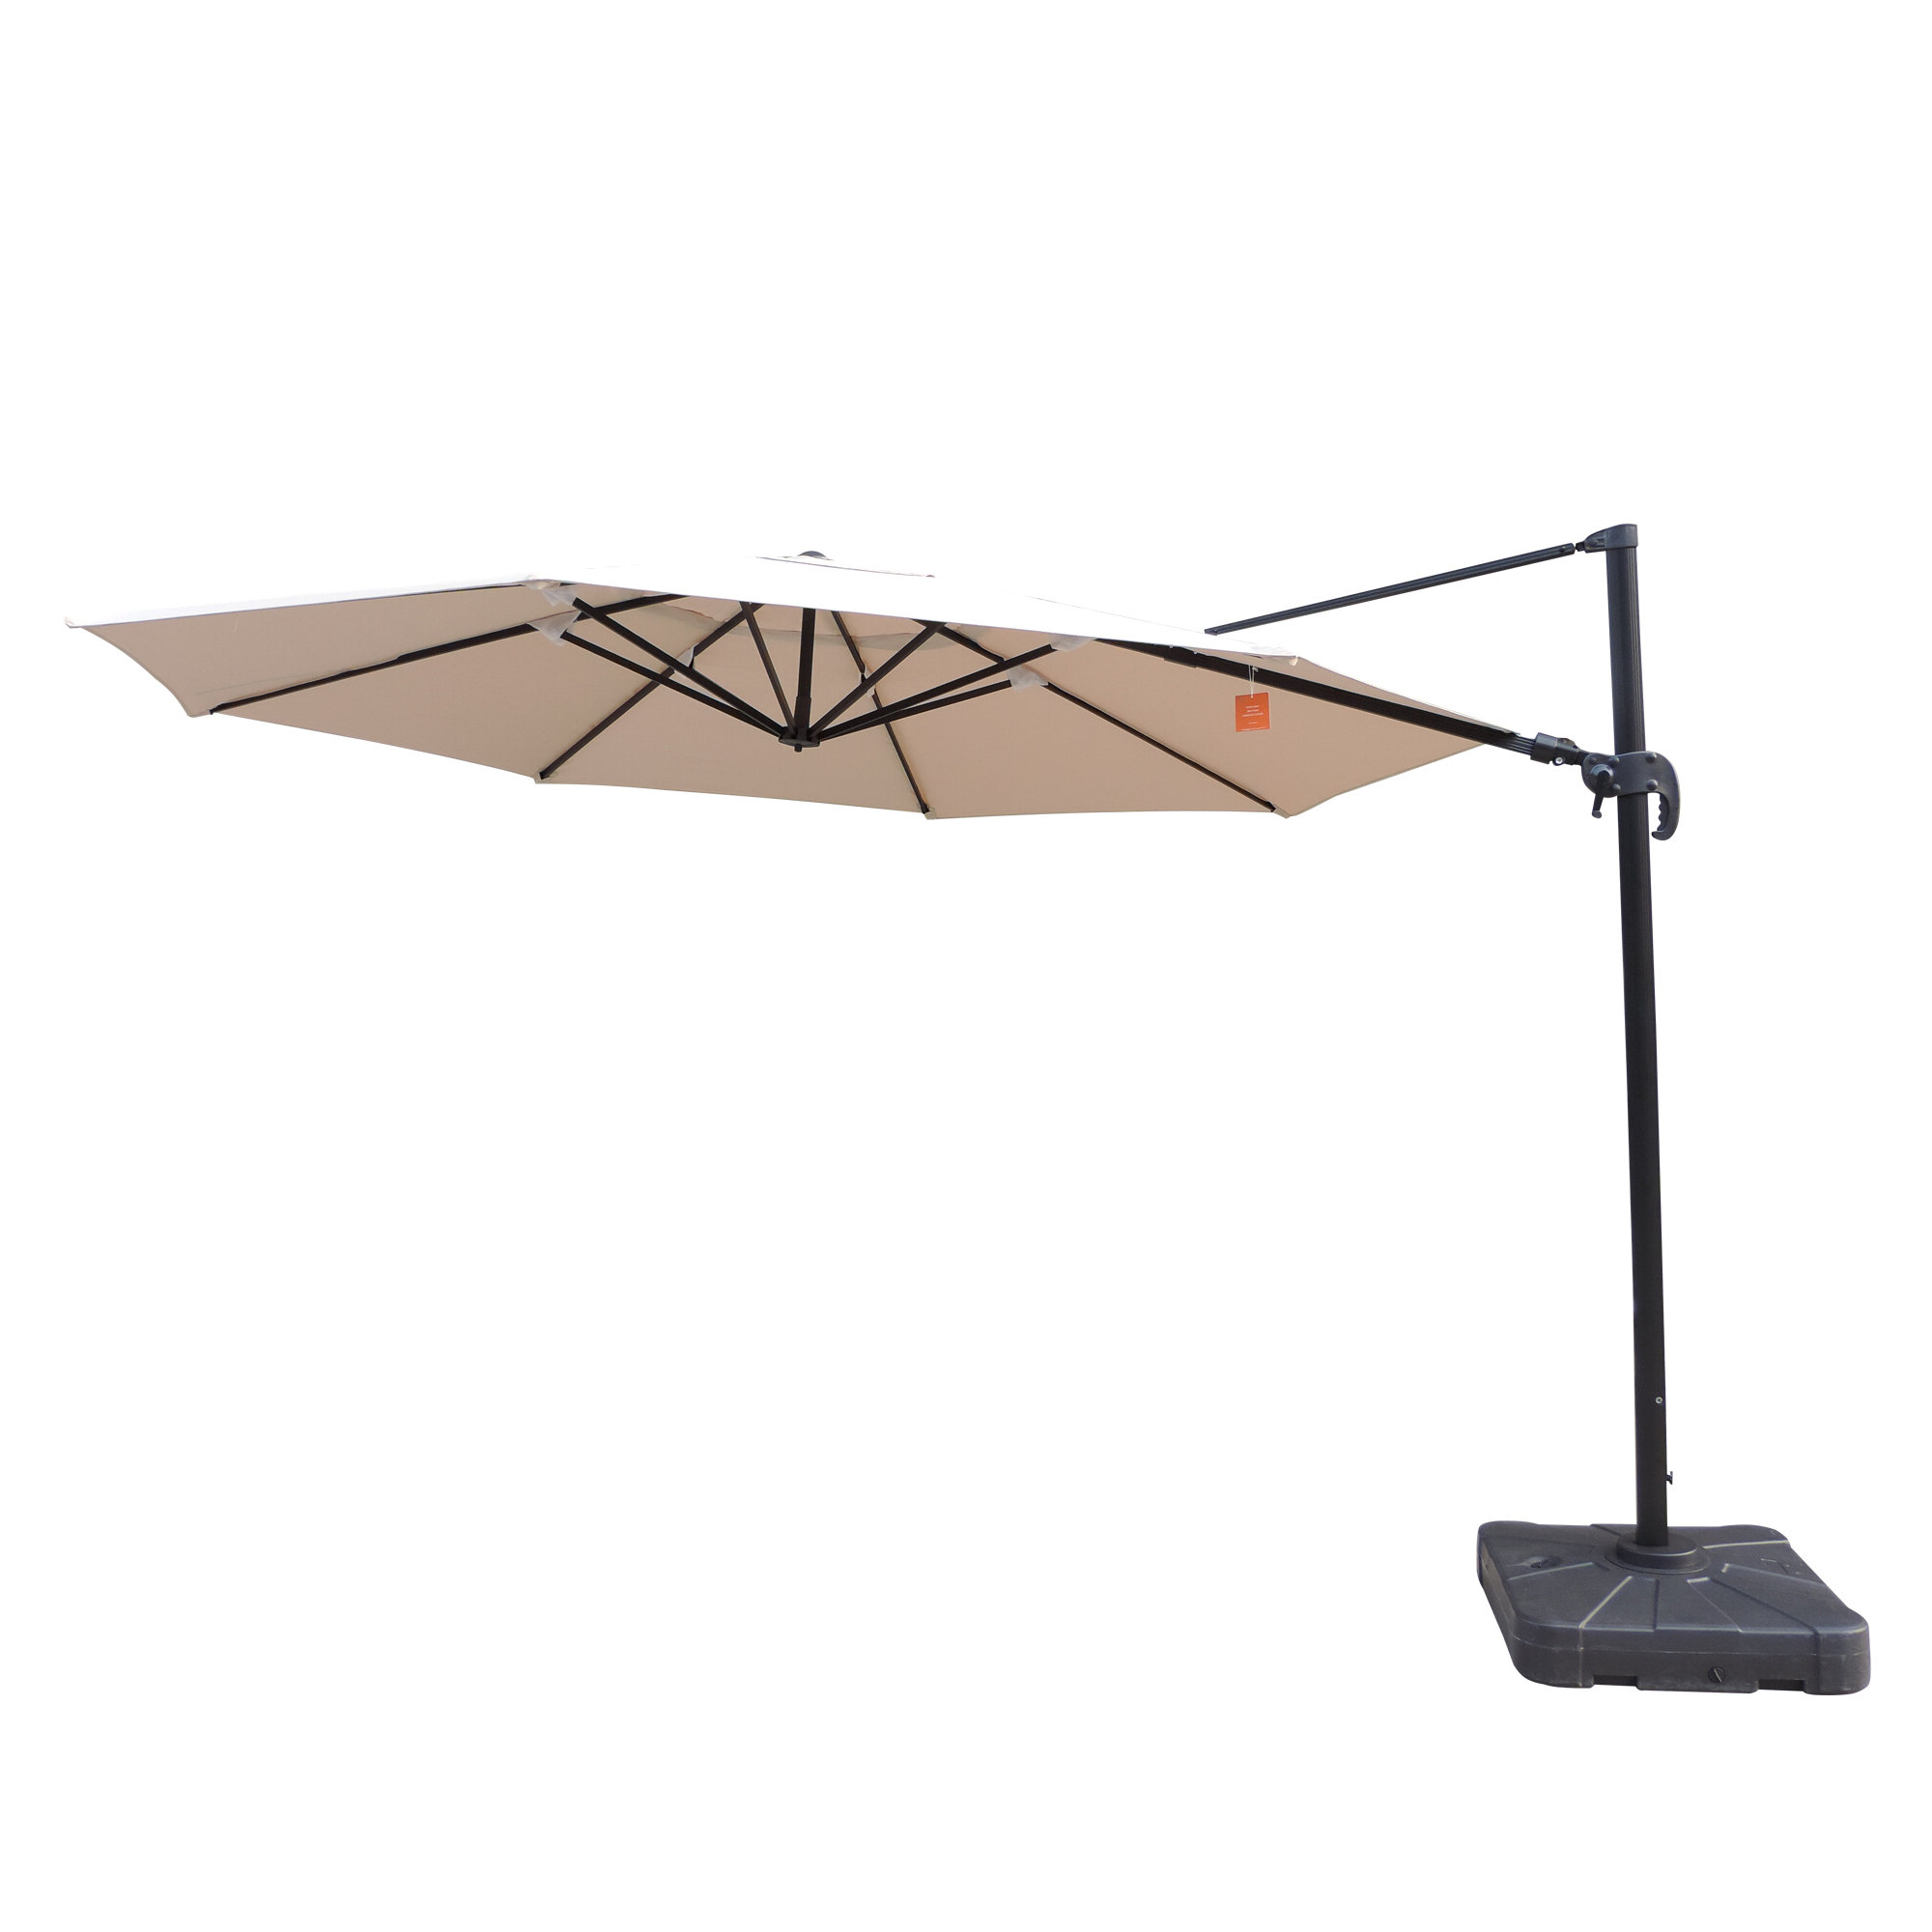 Canora Grey Lennie 13' Cantilever Sunbrella Umbrella With Regard To Current Voss Cantilever Sunbrella Umbrellas (View 6 of 20)